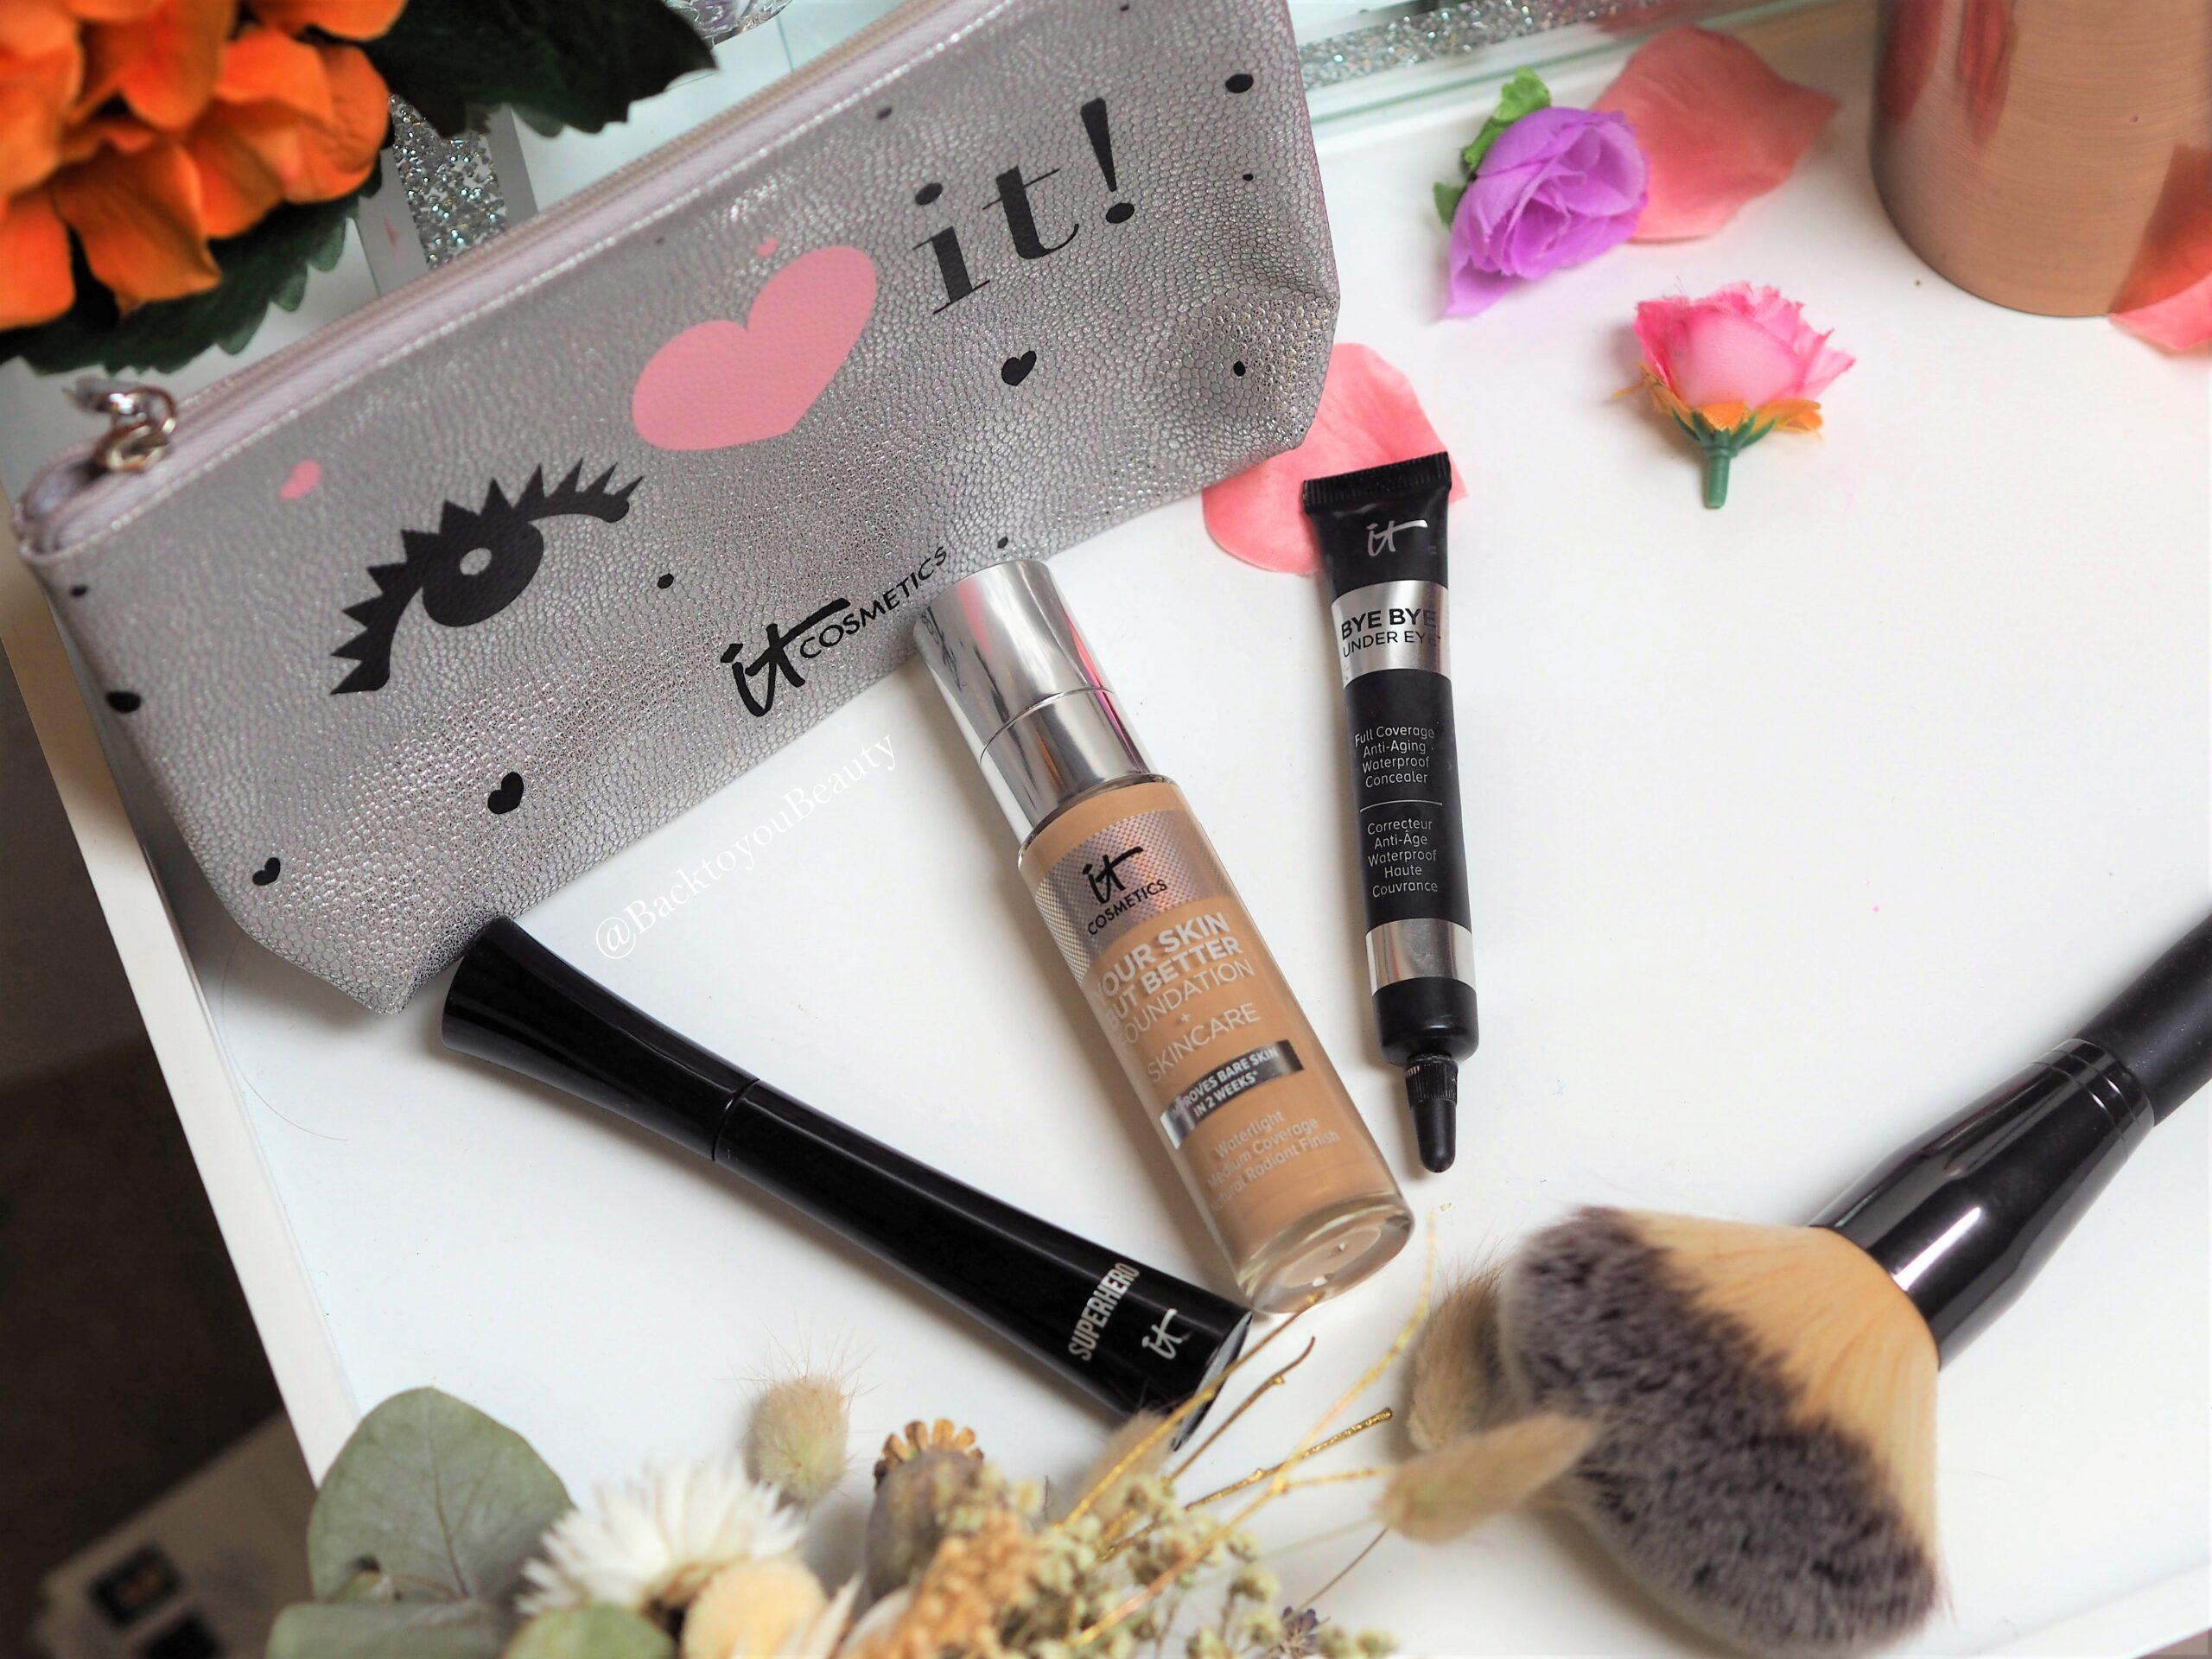 It Cosmetics qvc uk tsv october flatlay